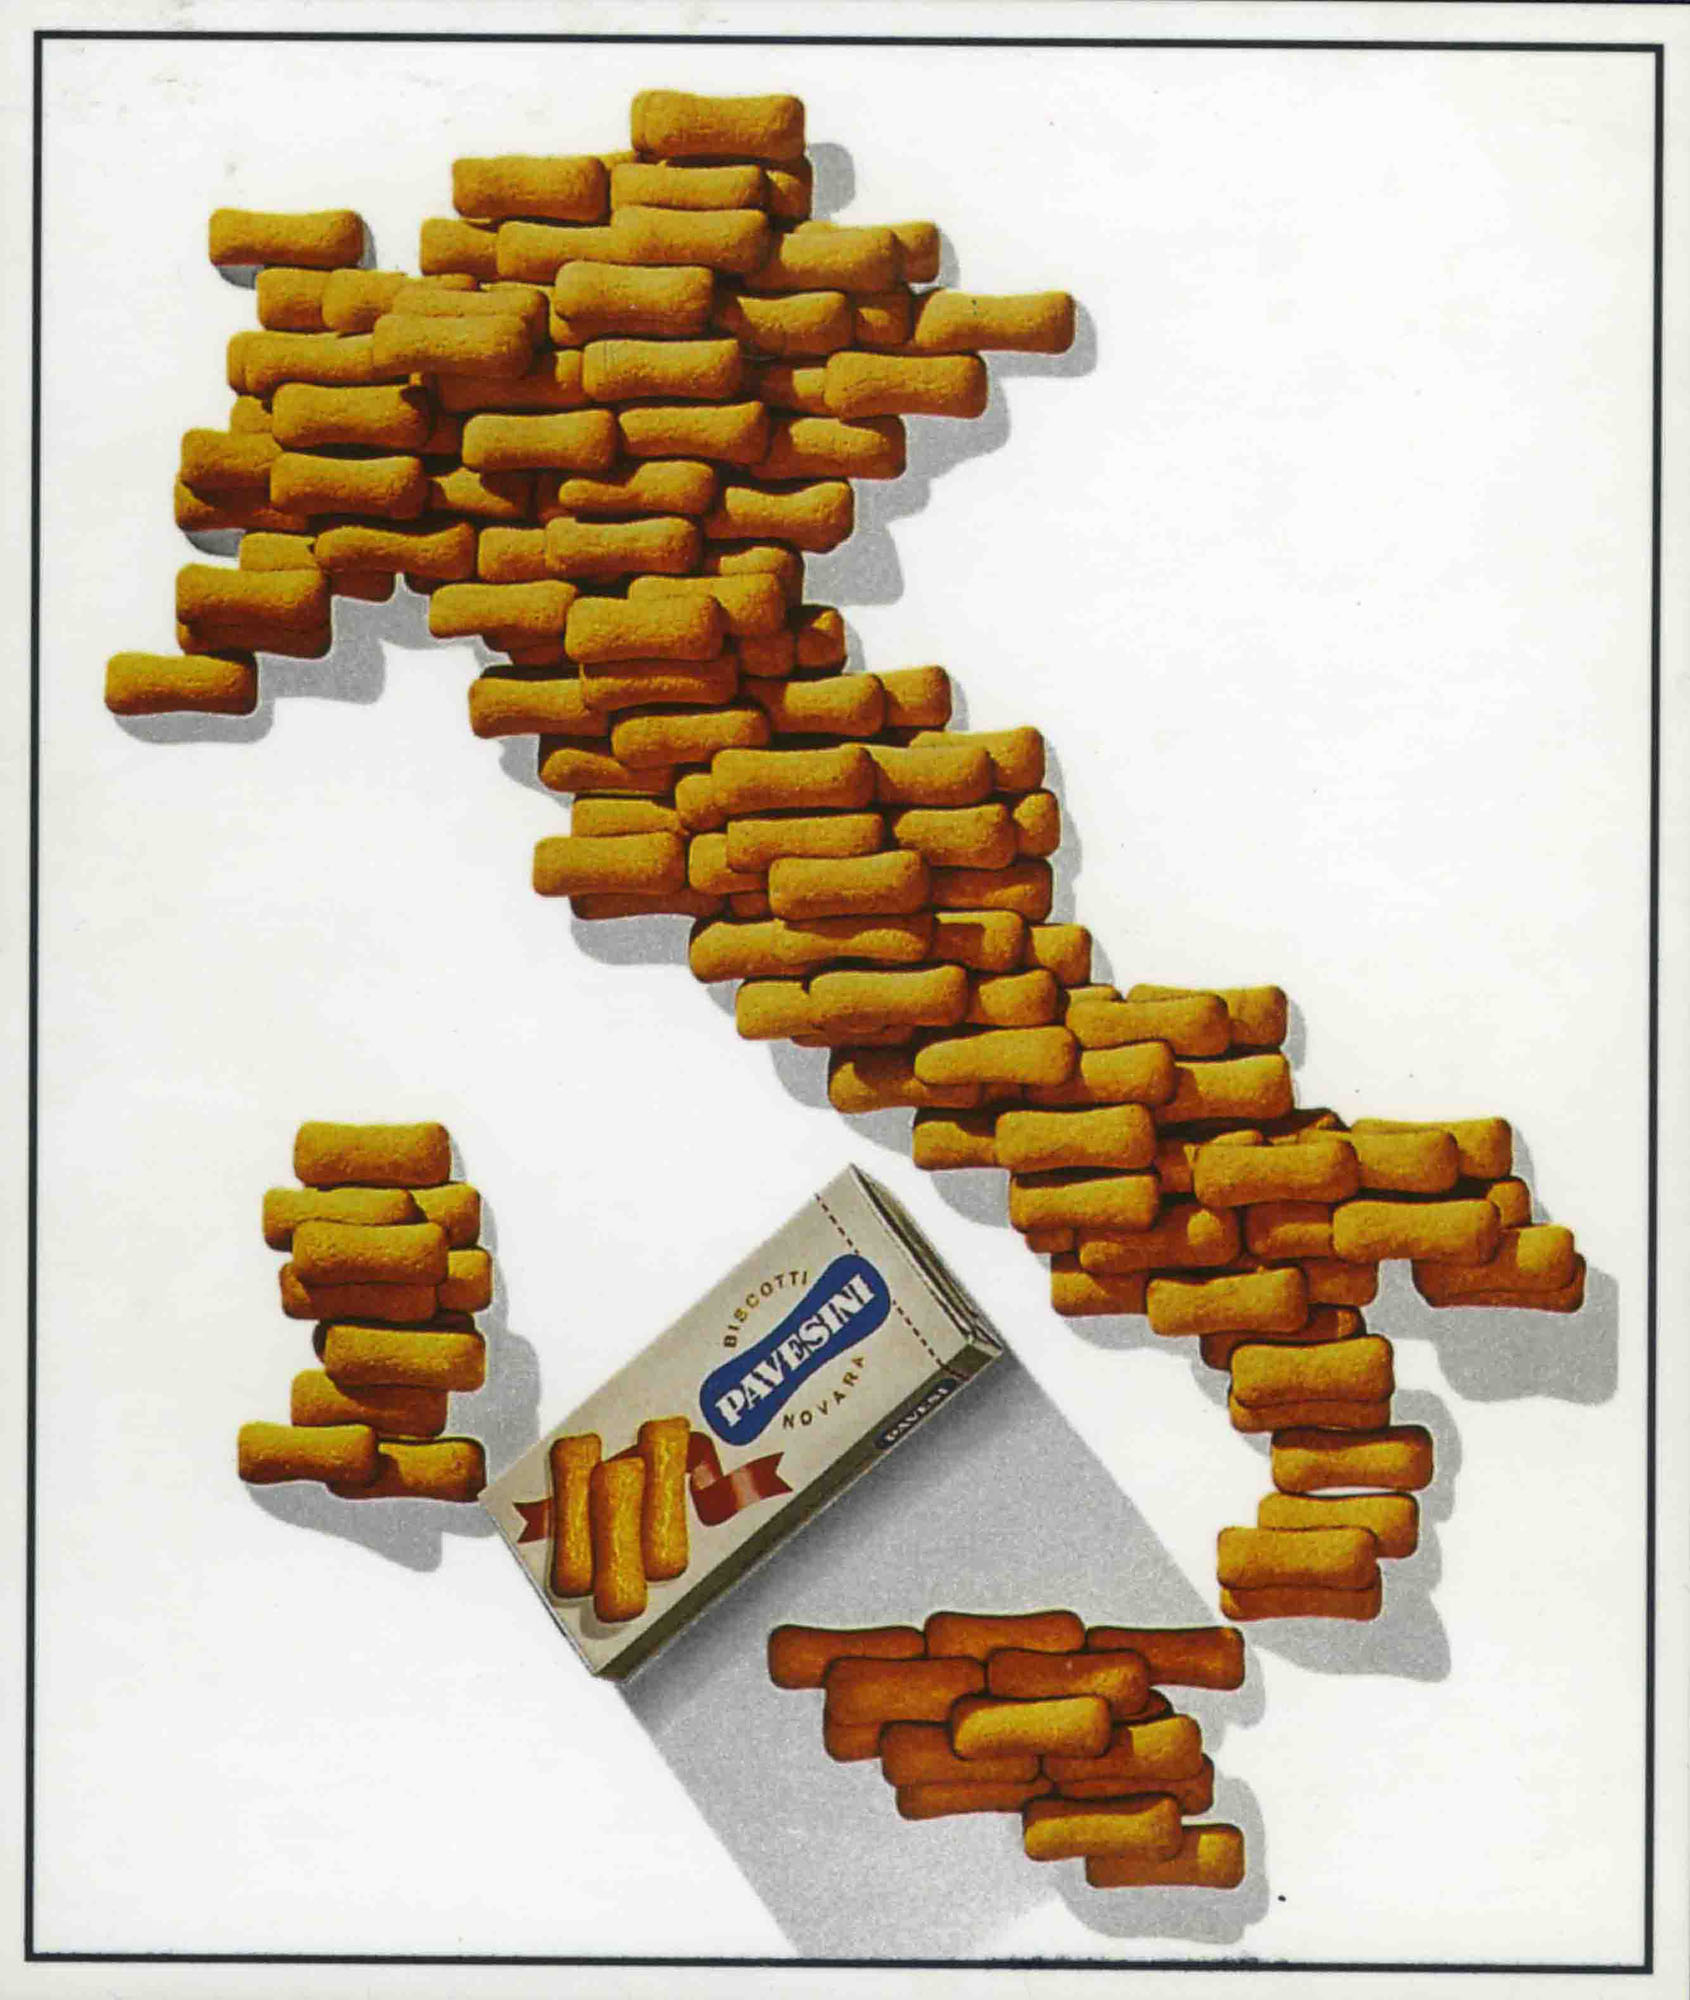 Pavesini posters - Erberto Carboni, Italy of Pavesini 1964